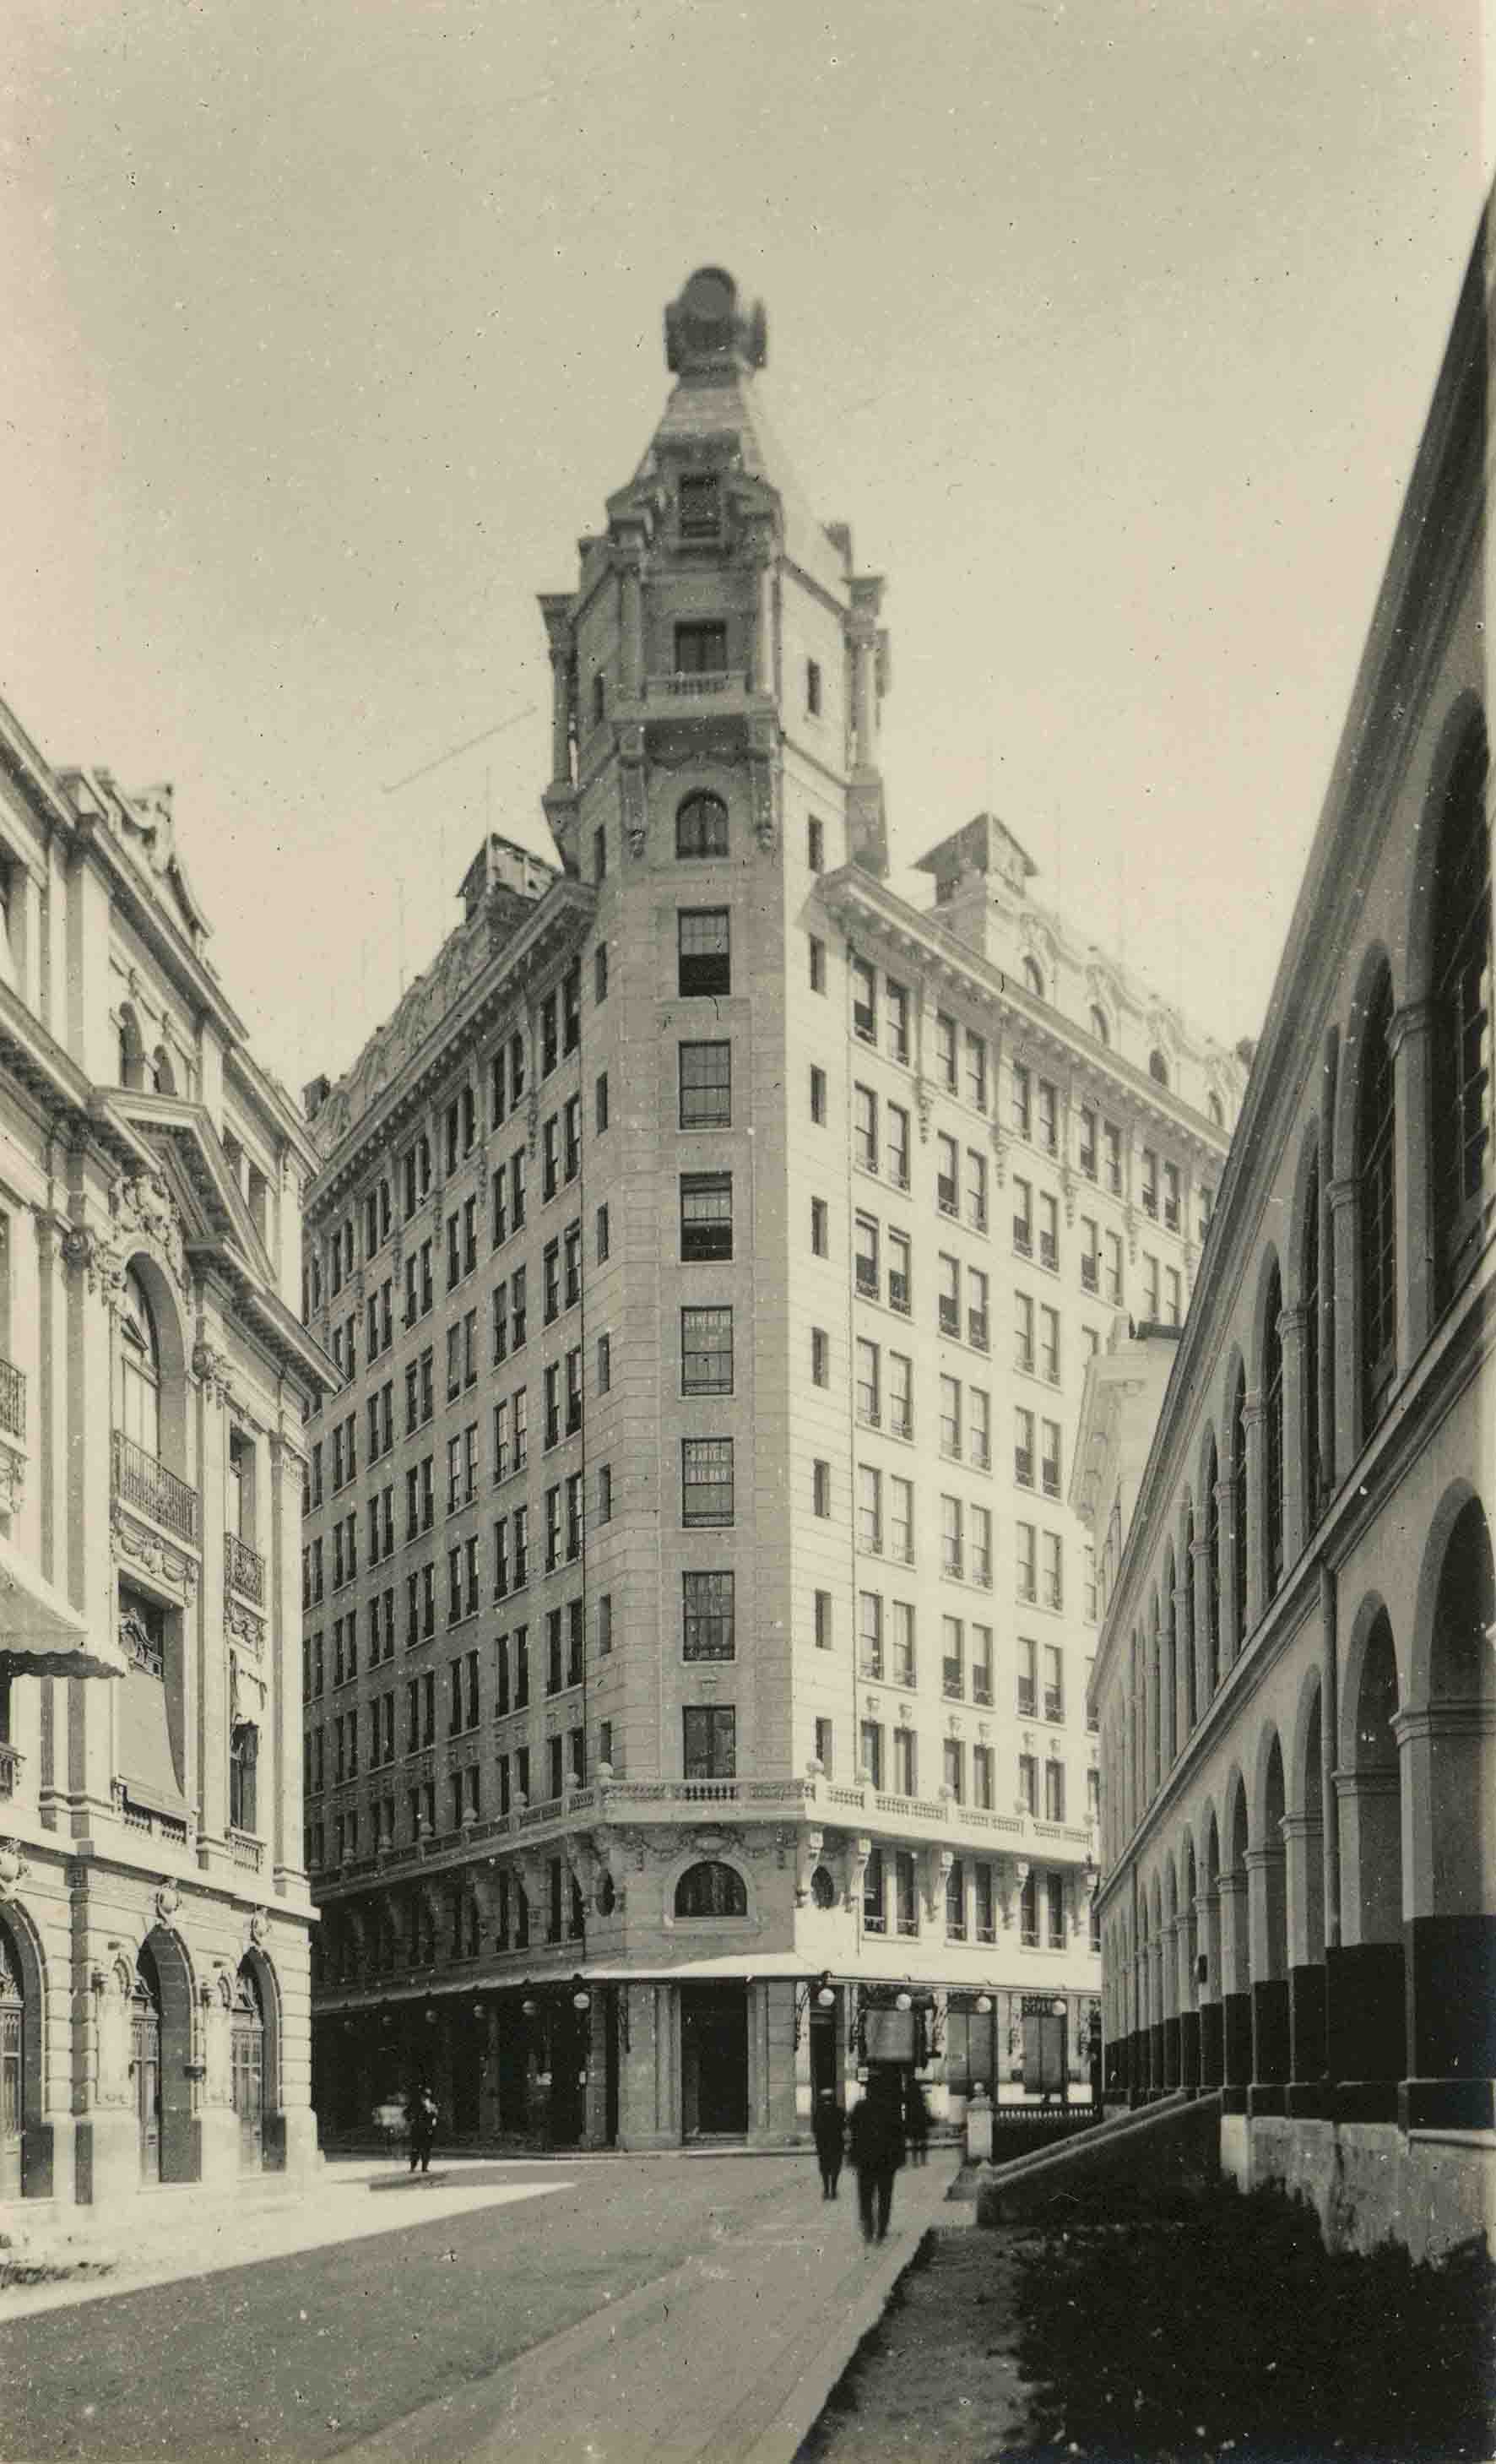 Enterreno - Fotos históricas de chile - fotos antiguas de Chile - Rascacielo Ariztía de Santiago ca. 1930